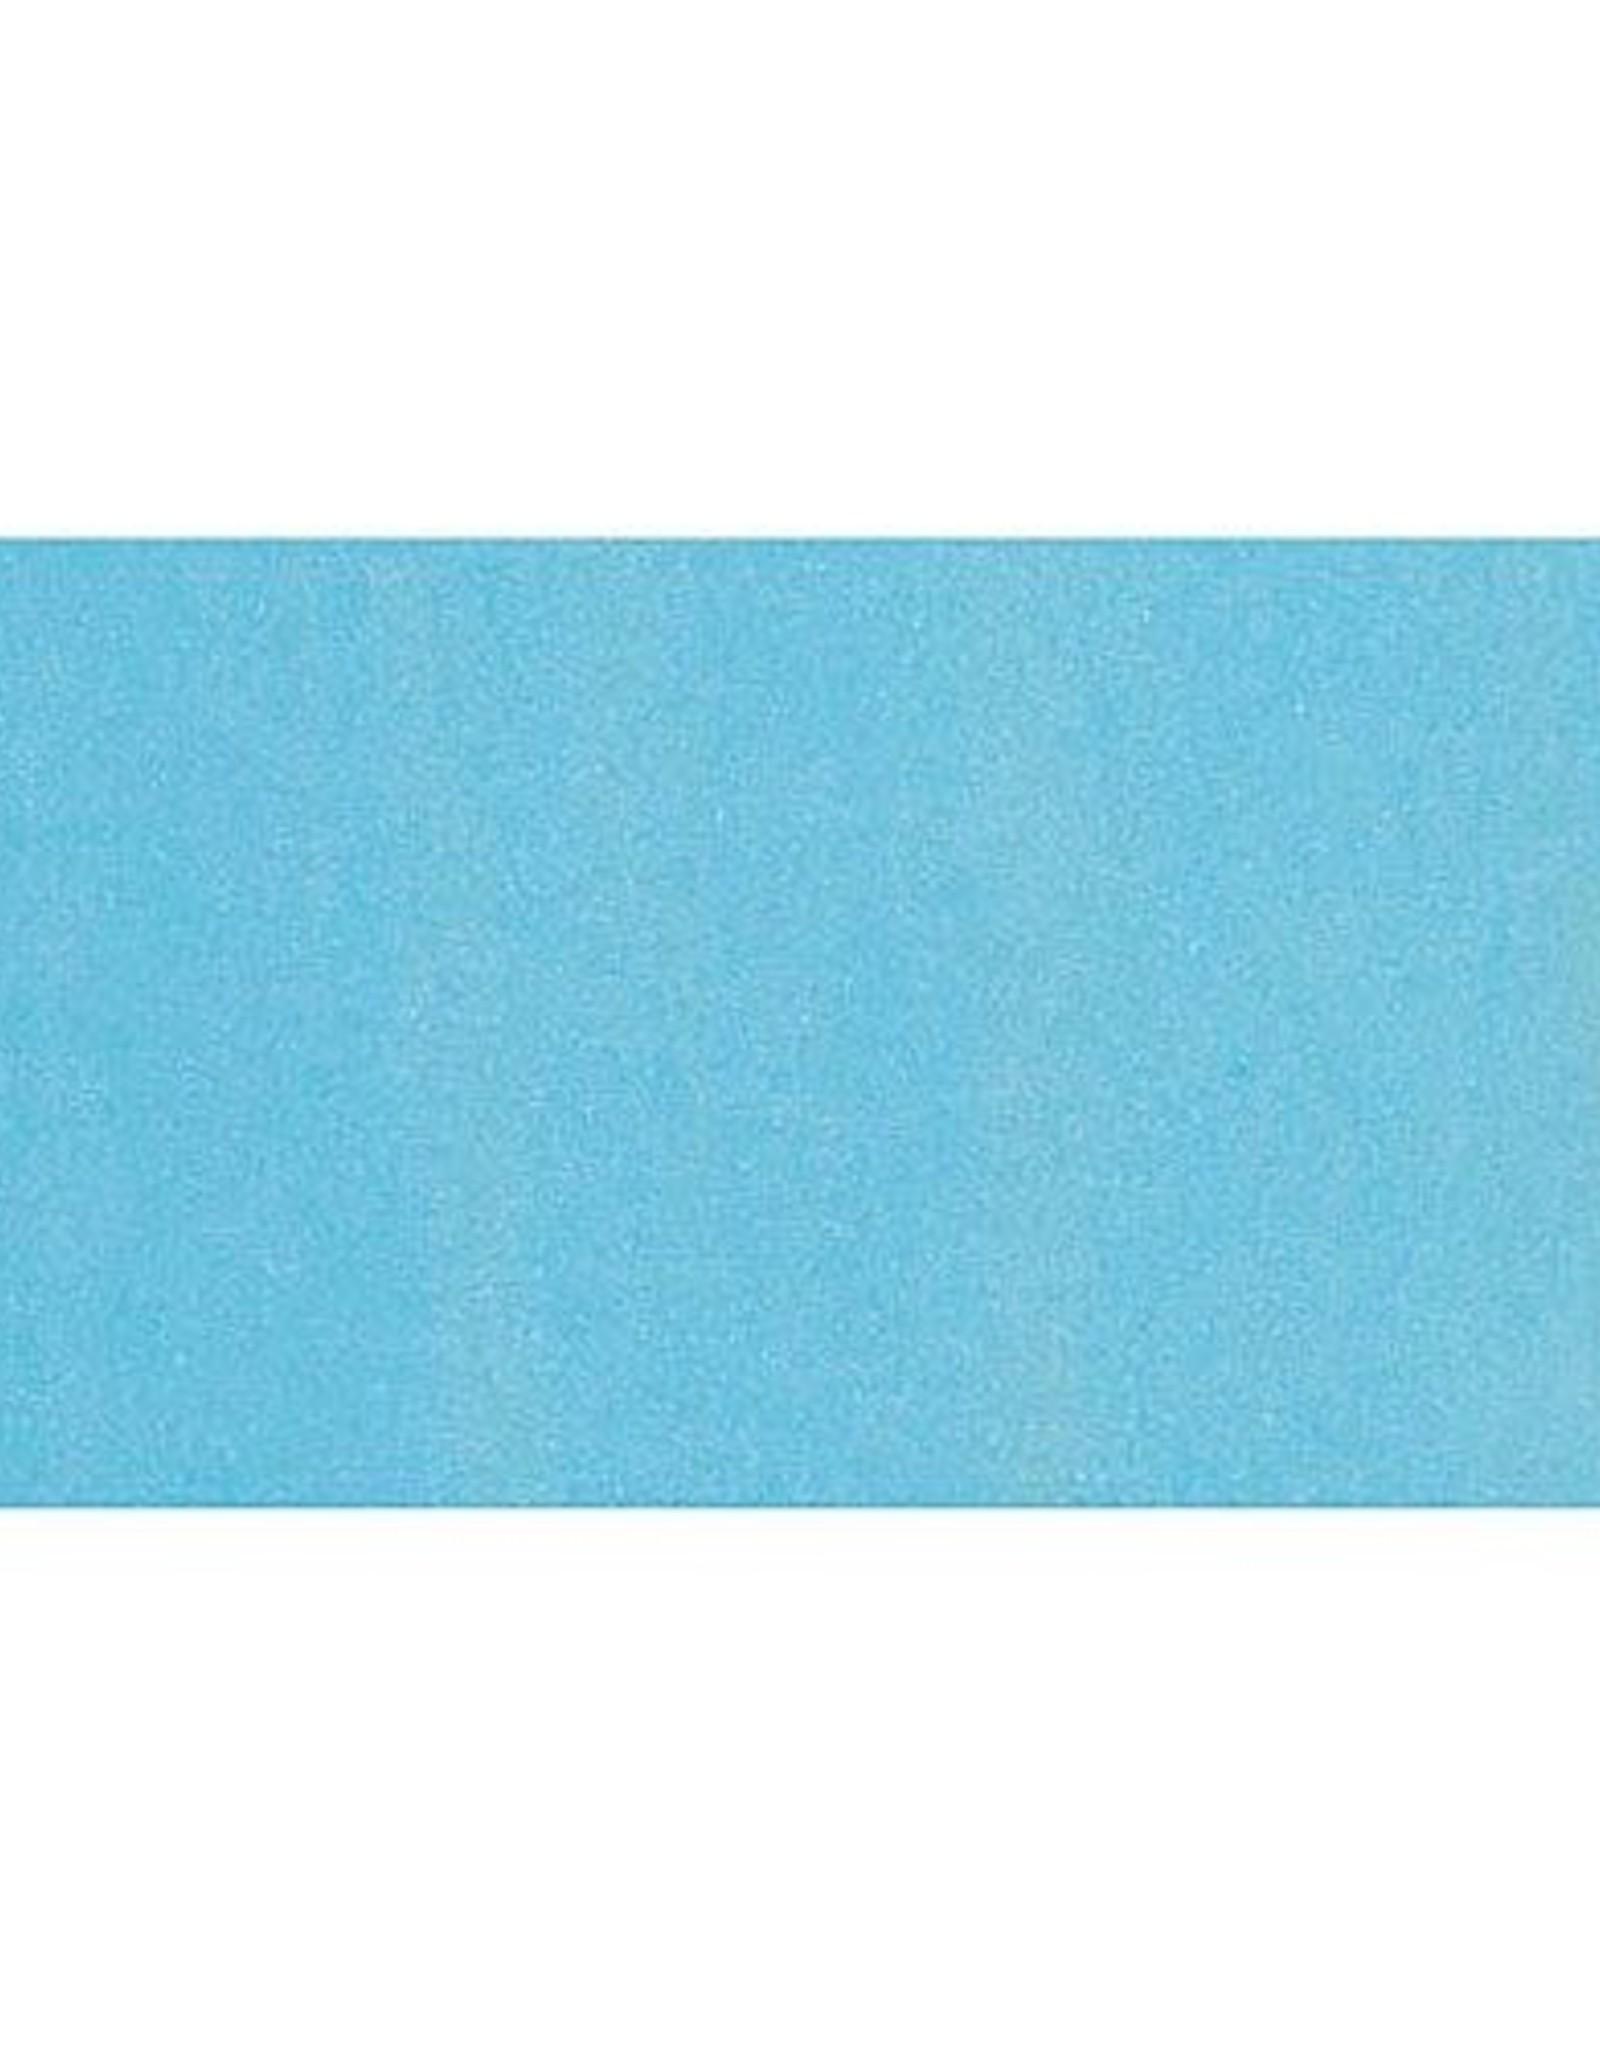 One Shot 1Shot Letter Enaml 4oz Pck Blu